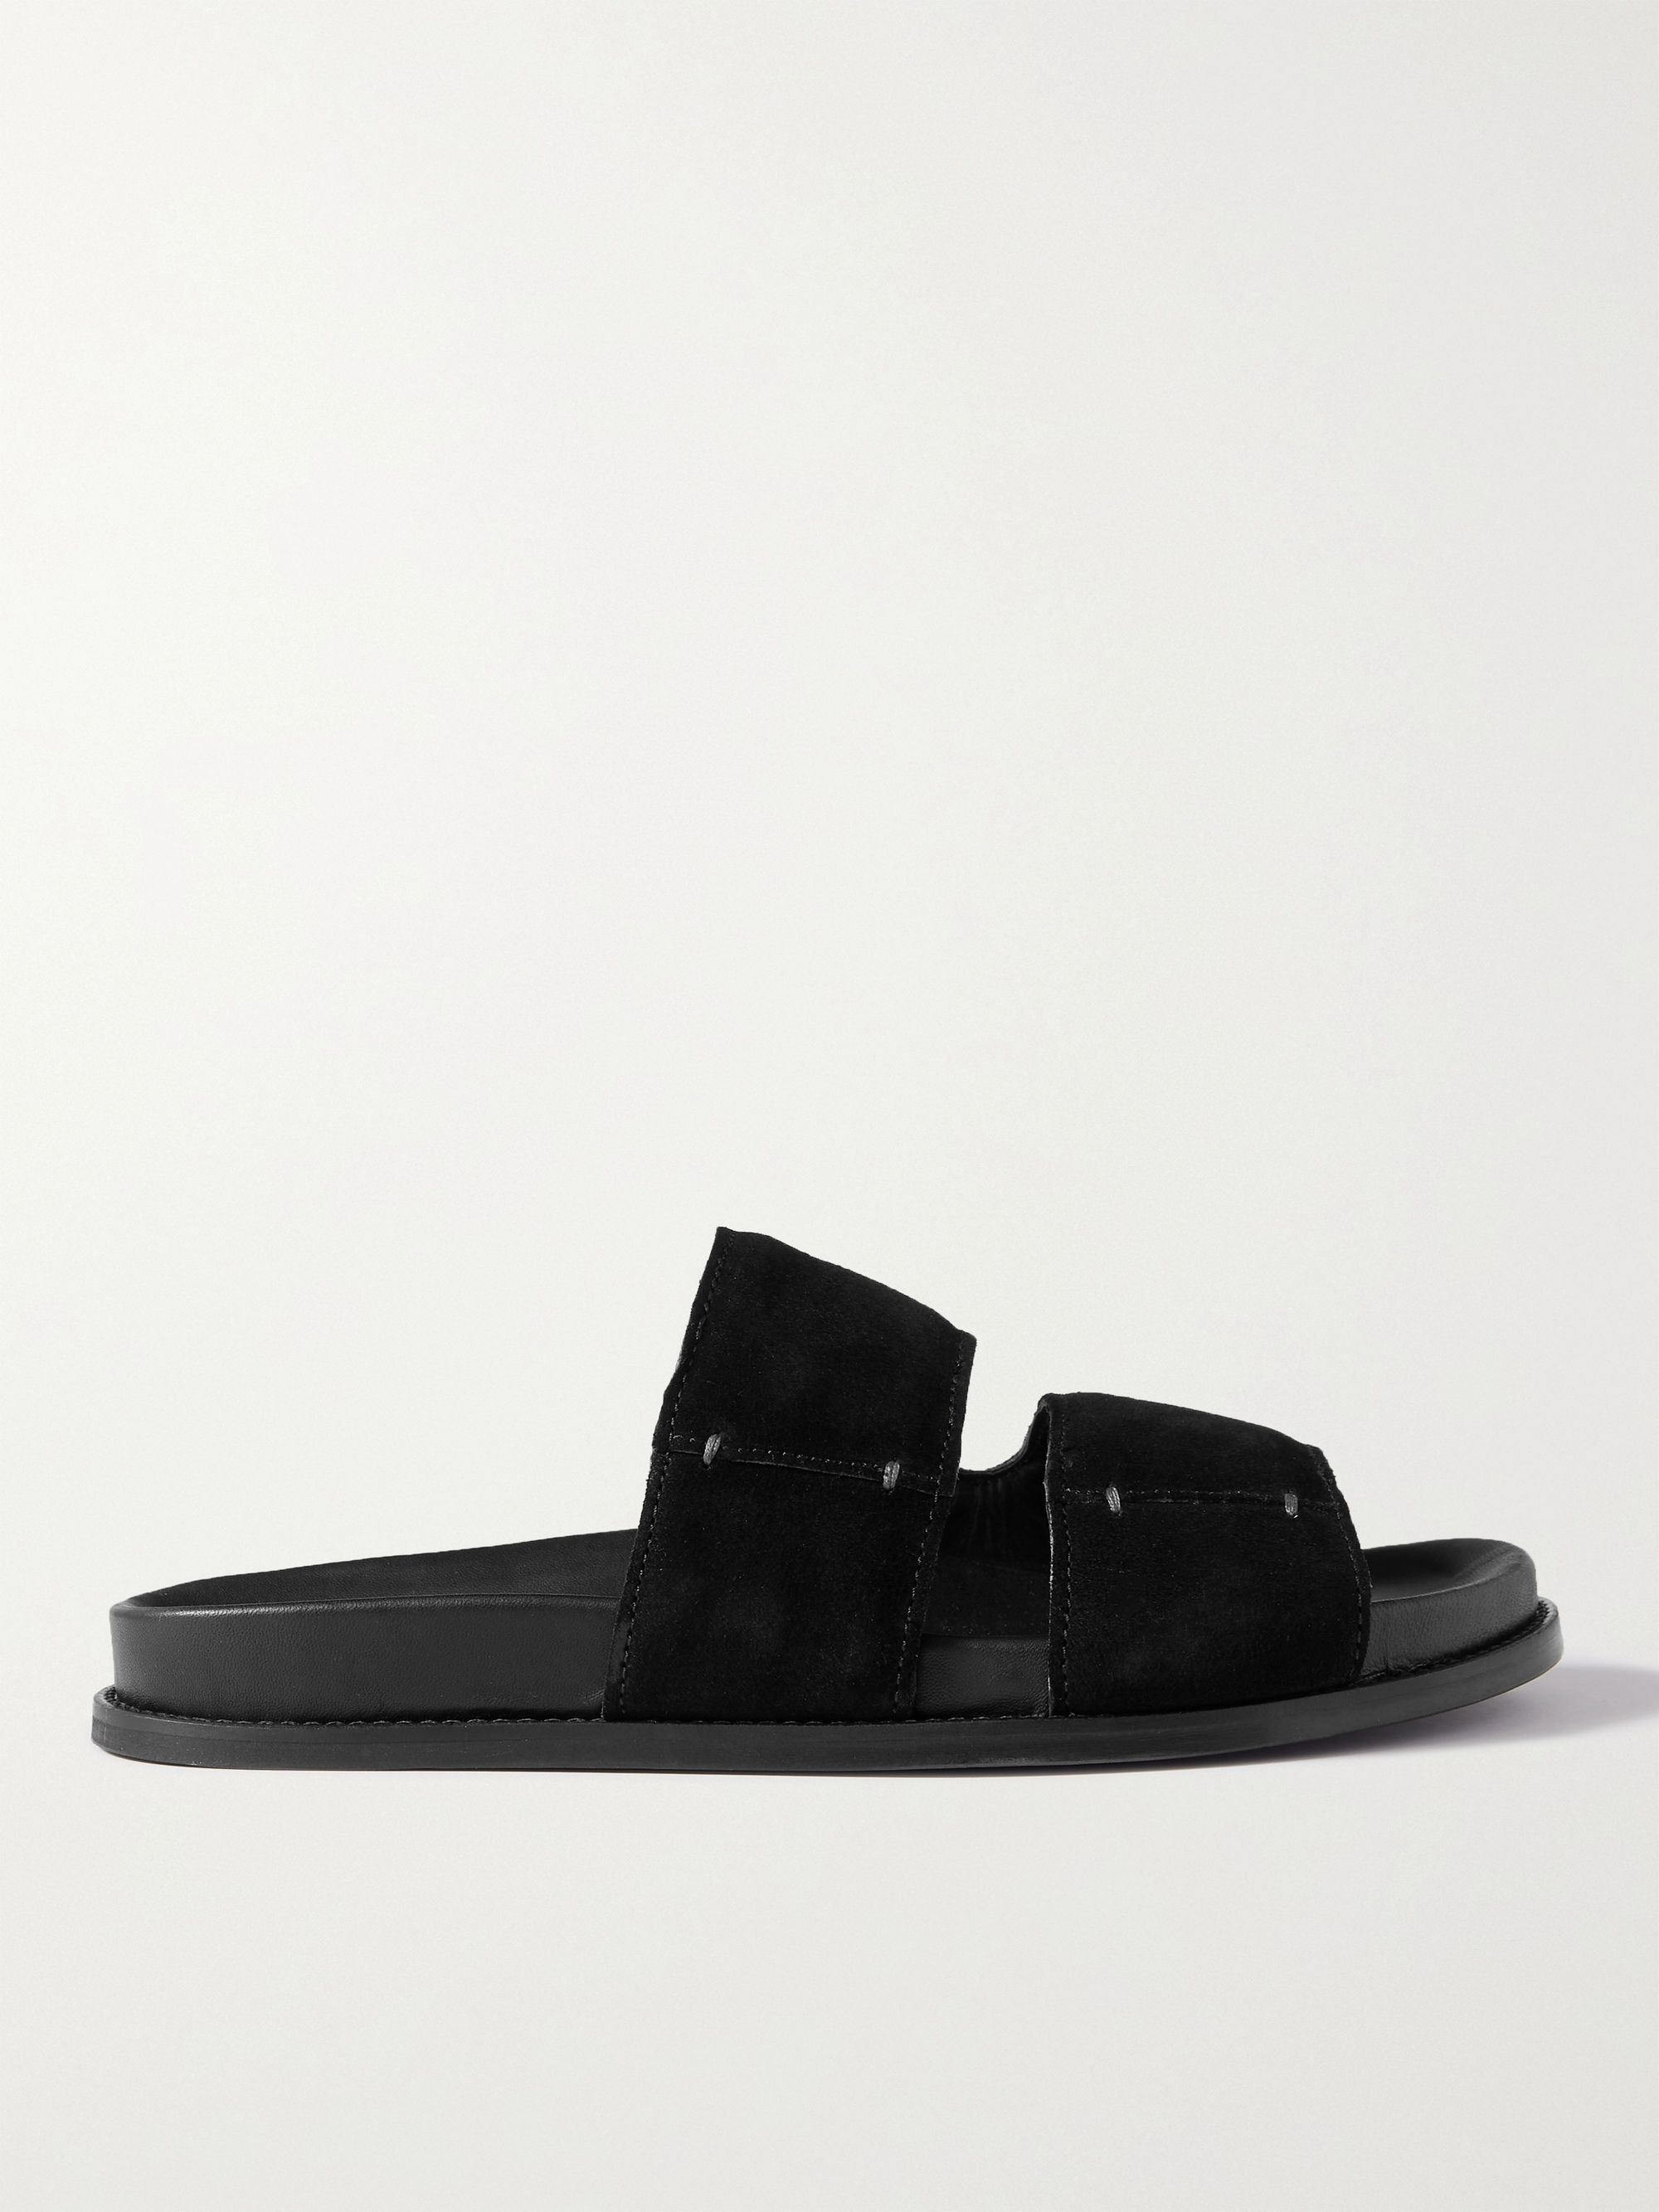 MR P. David Suede Sandals,Black